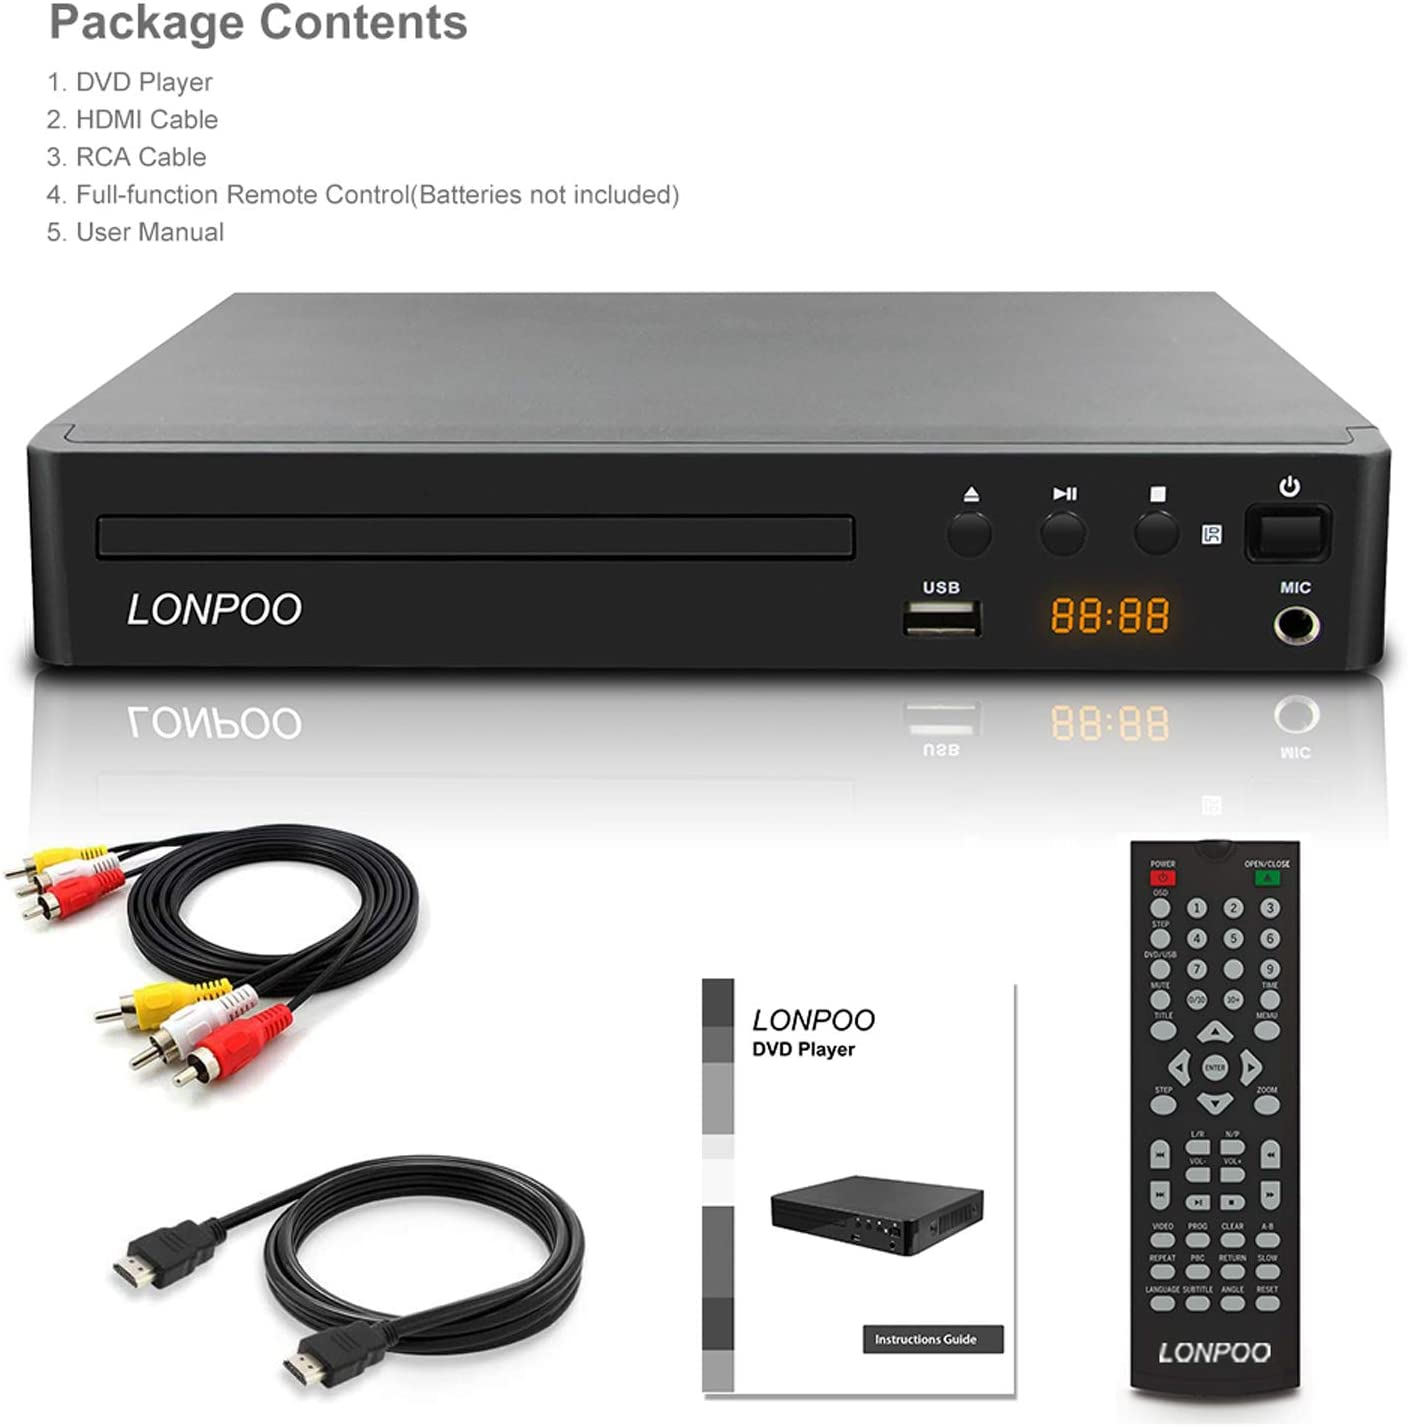 LP-099 Reproductor de DVD, Compact DVD Player (Full HD,HDMI, USB ...